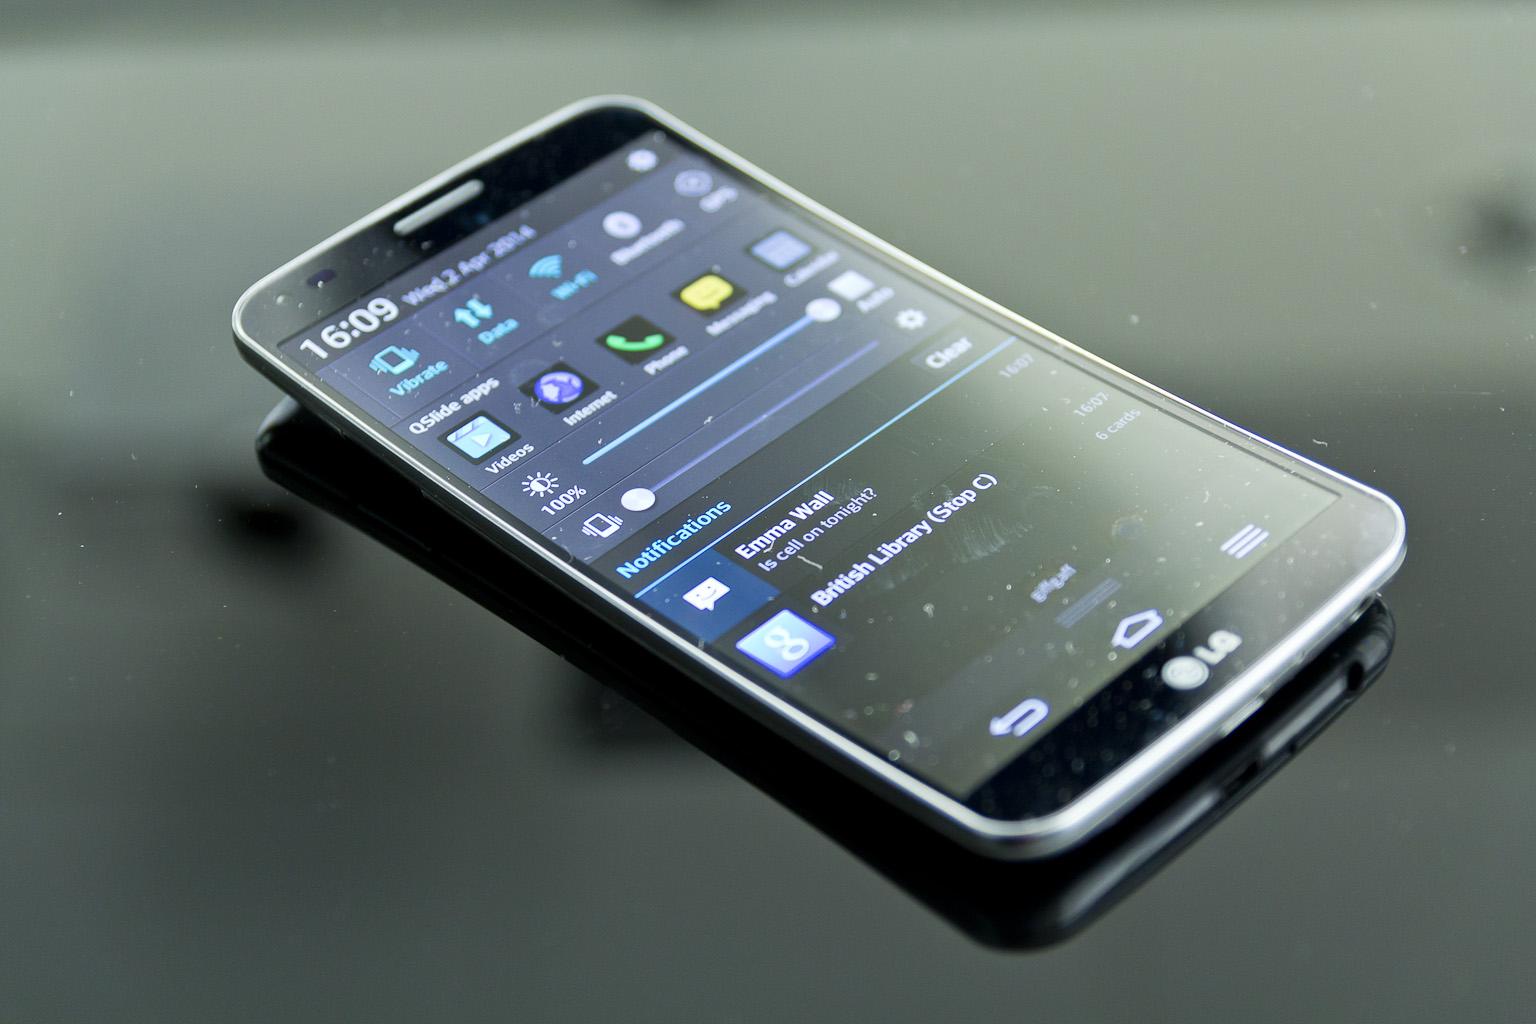 LG G FLEX2 Full Phone Specifications